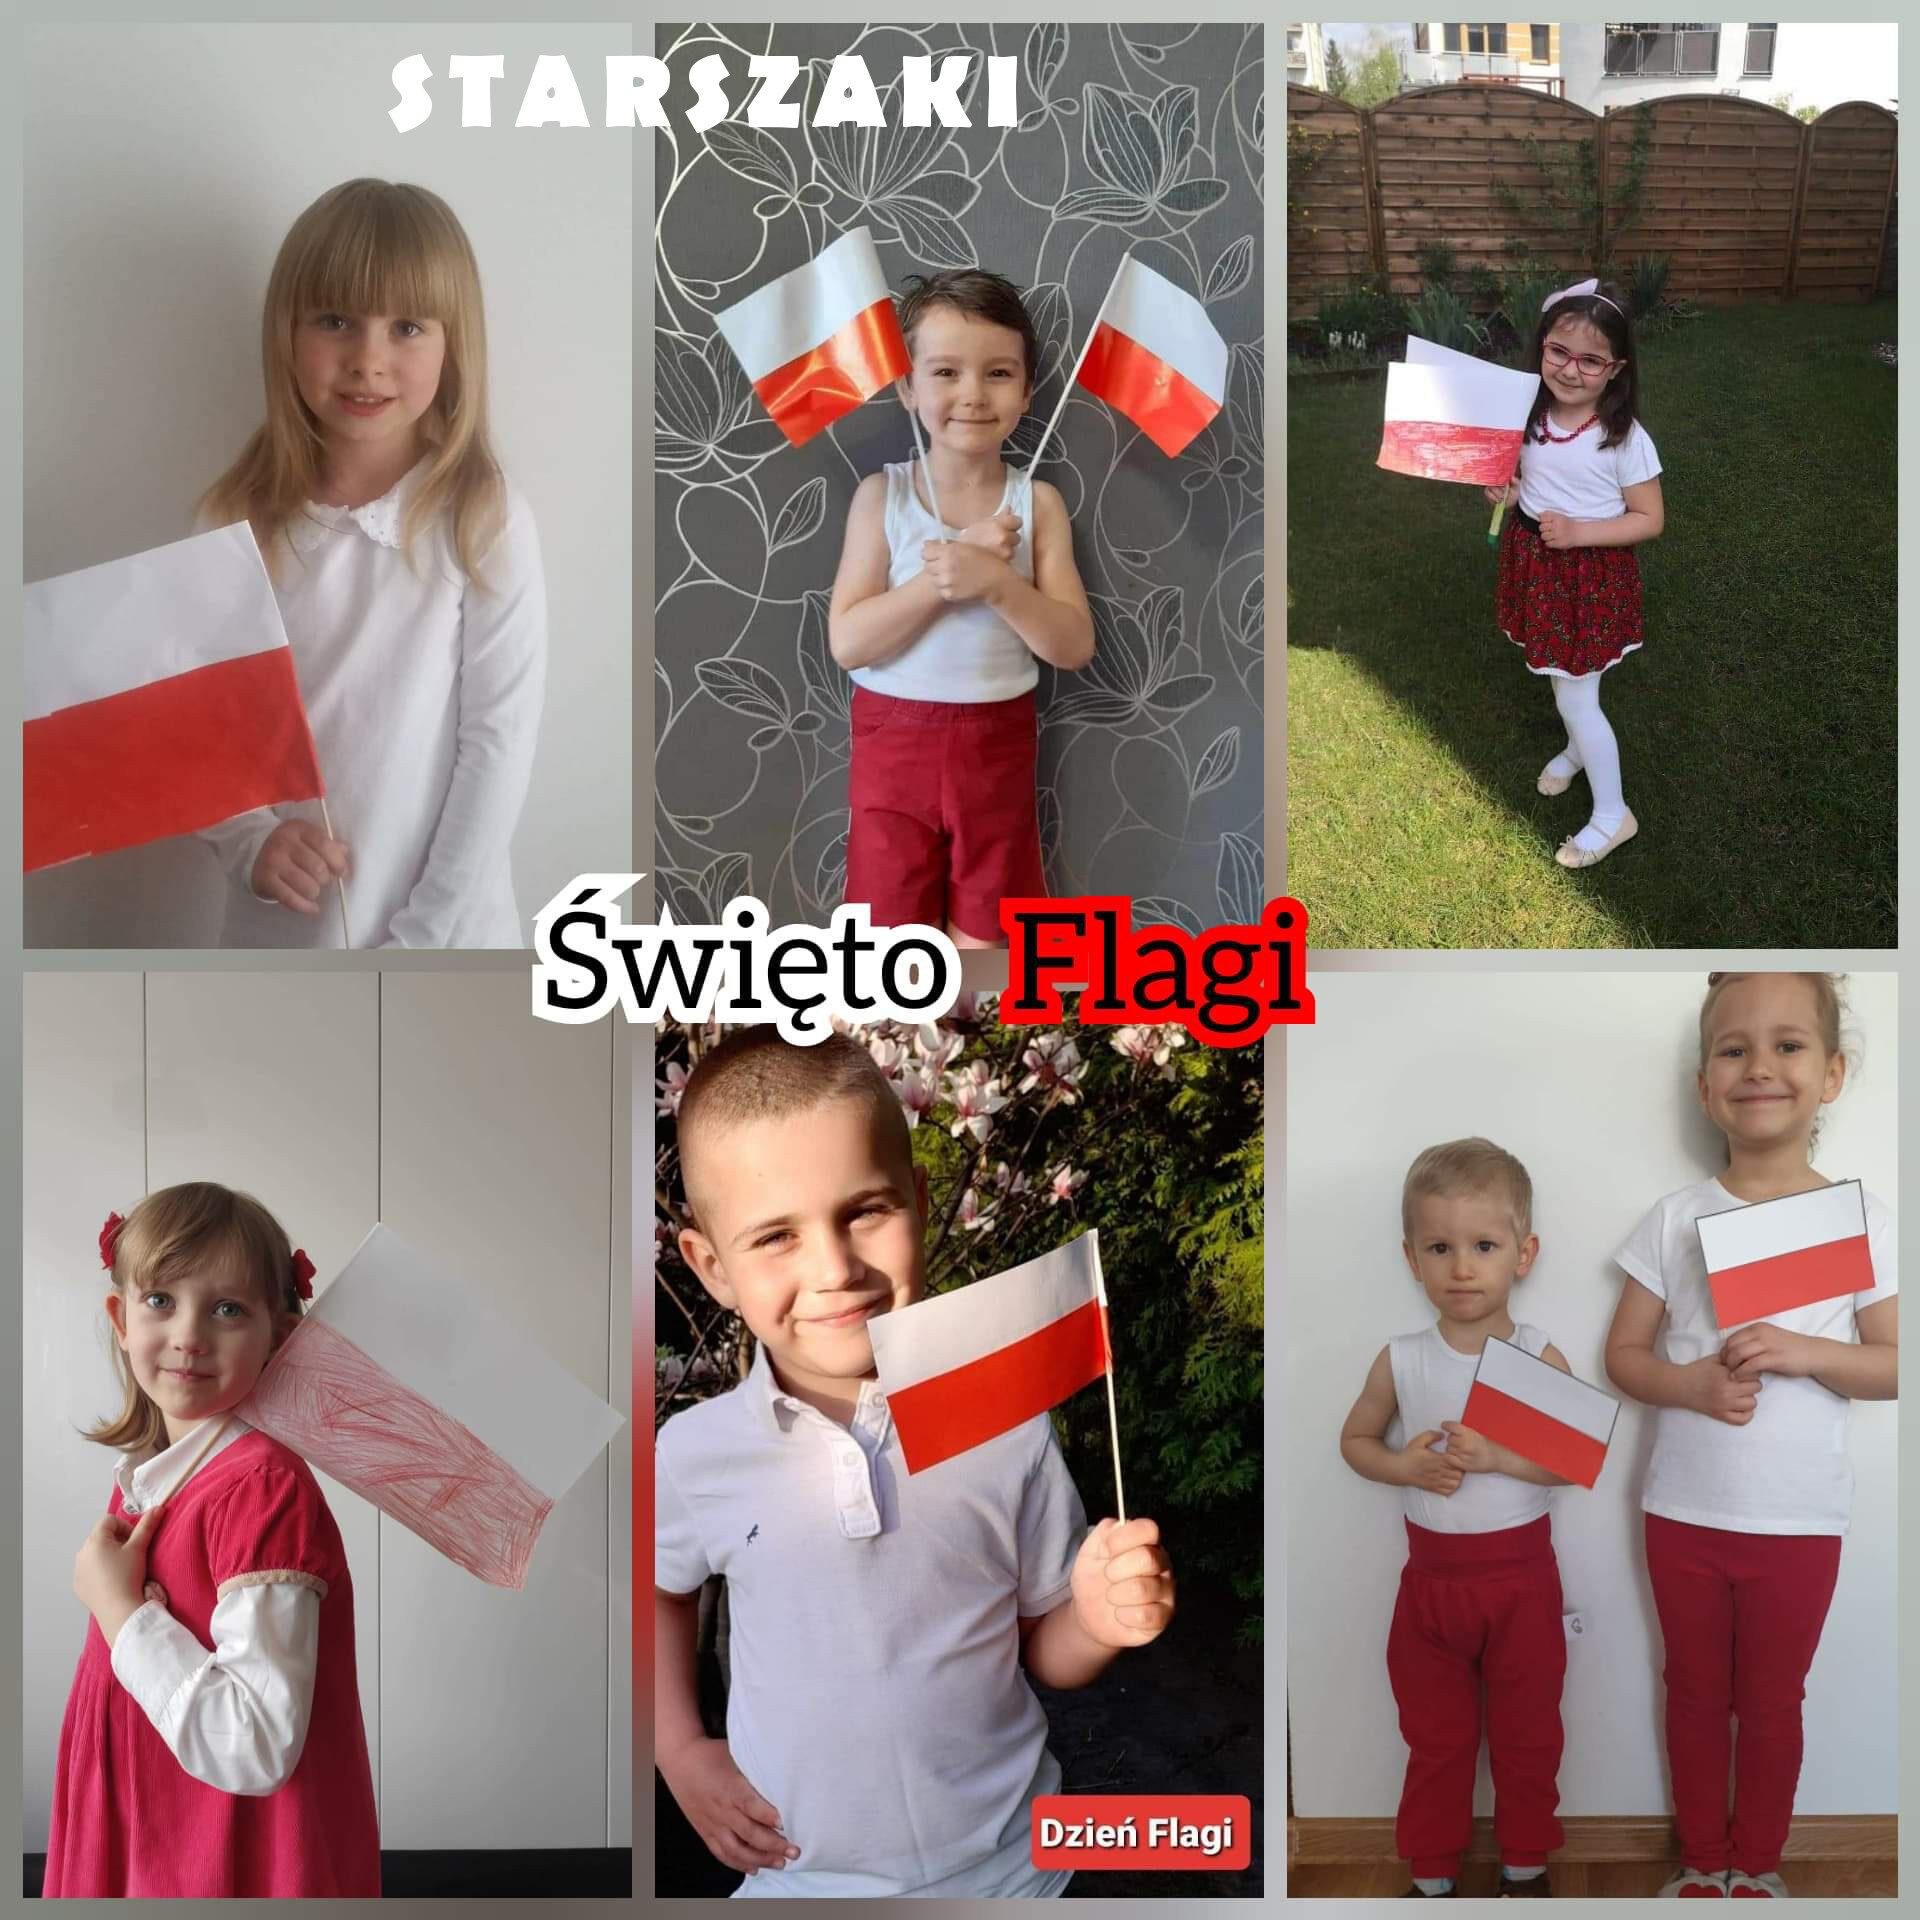 STARSZAKI 4